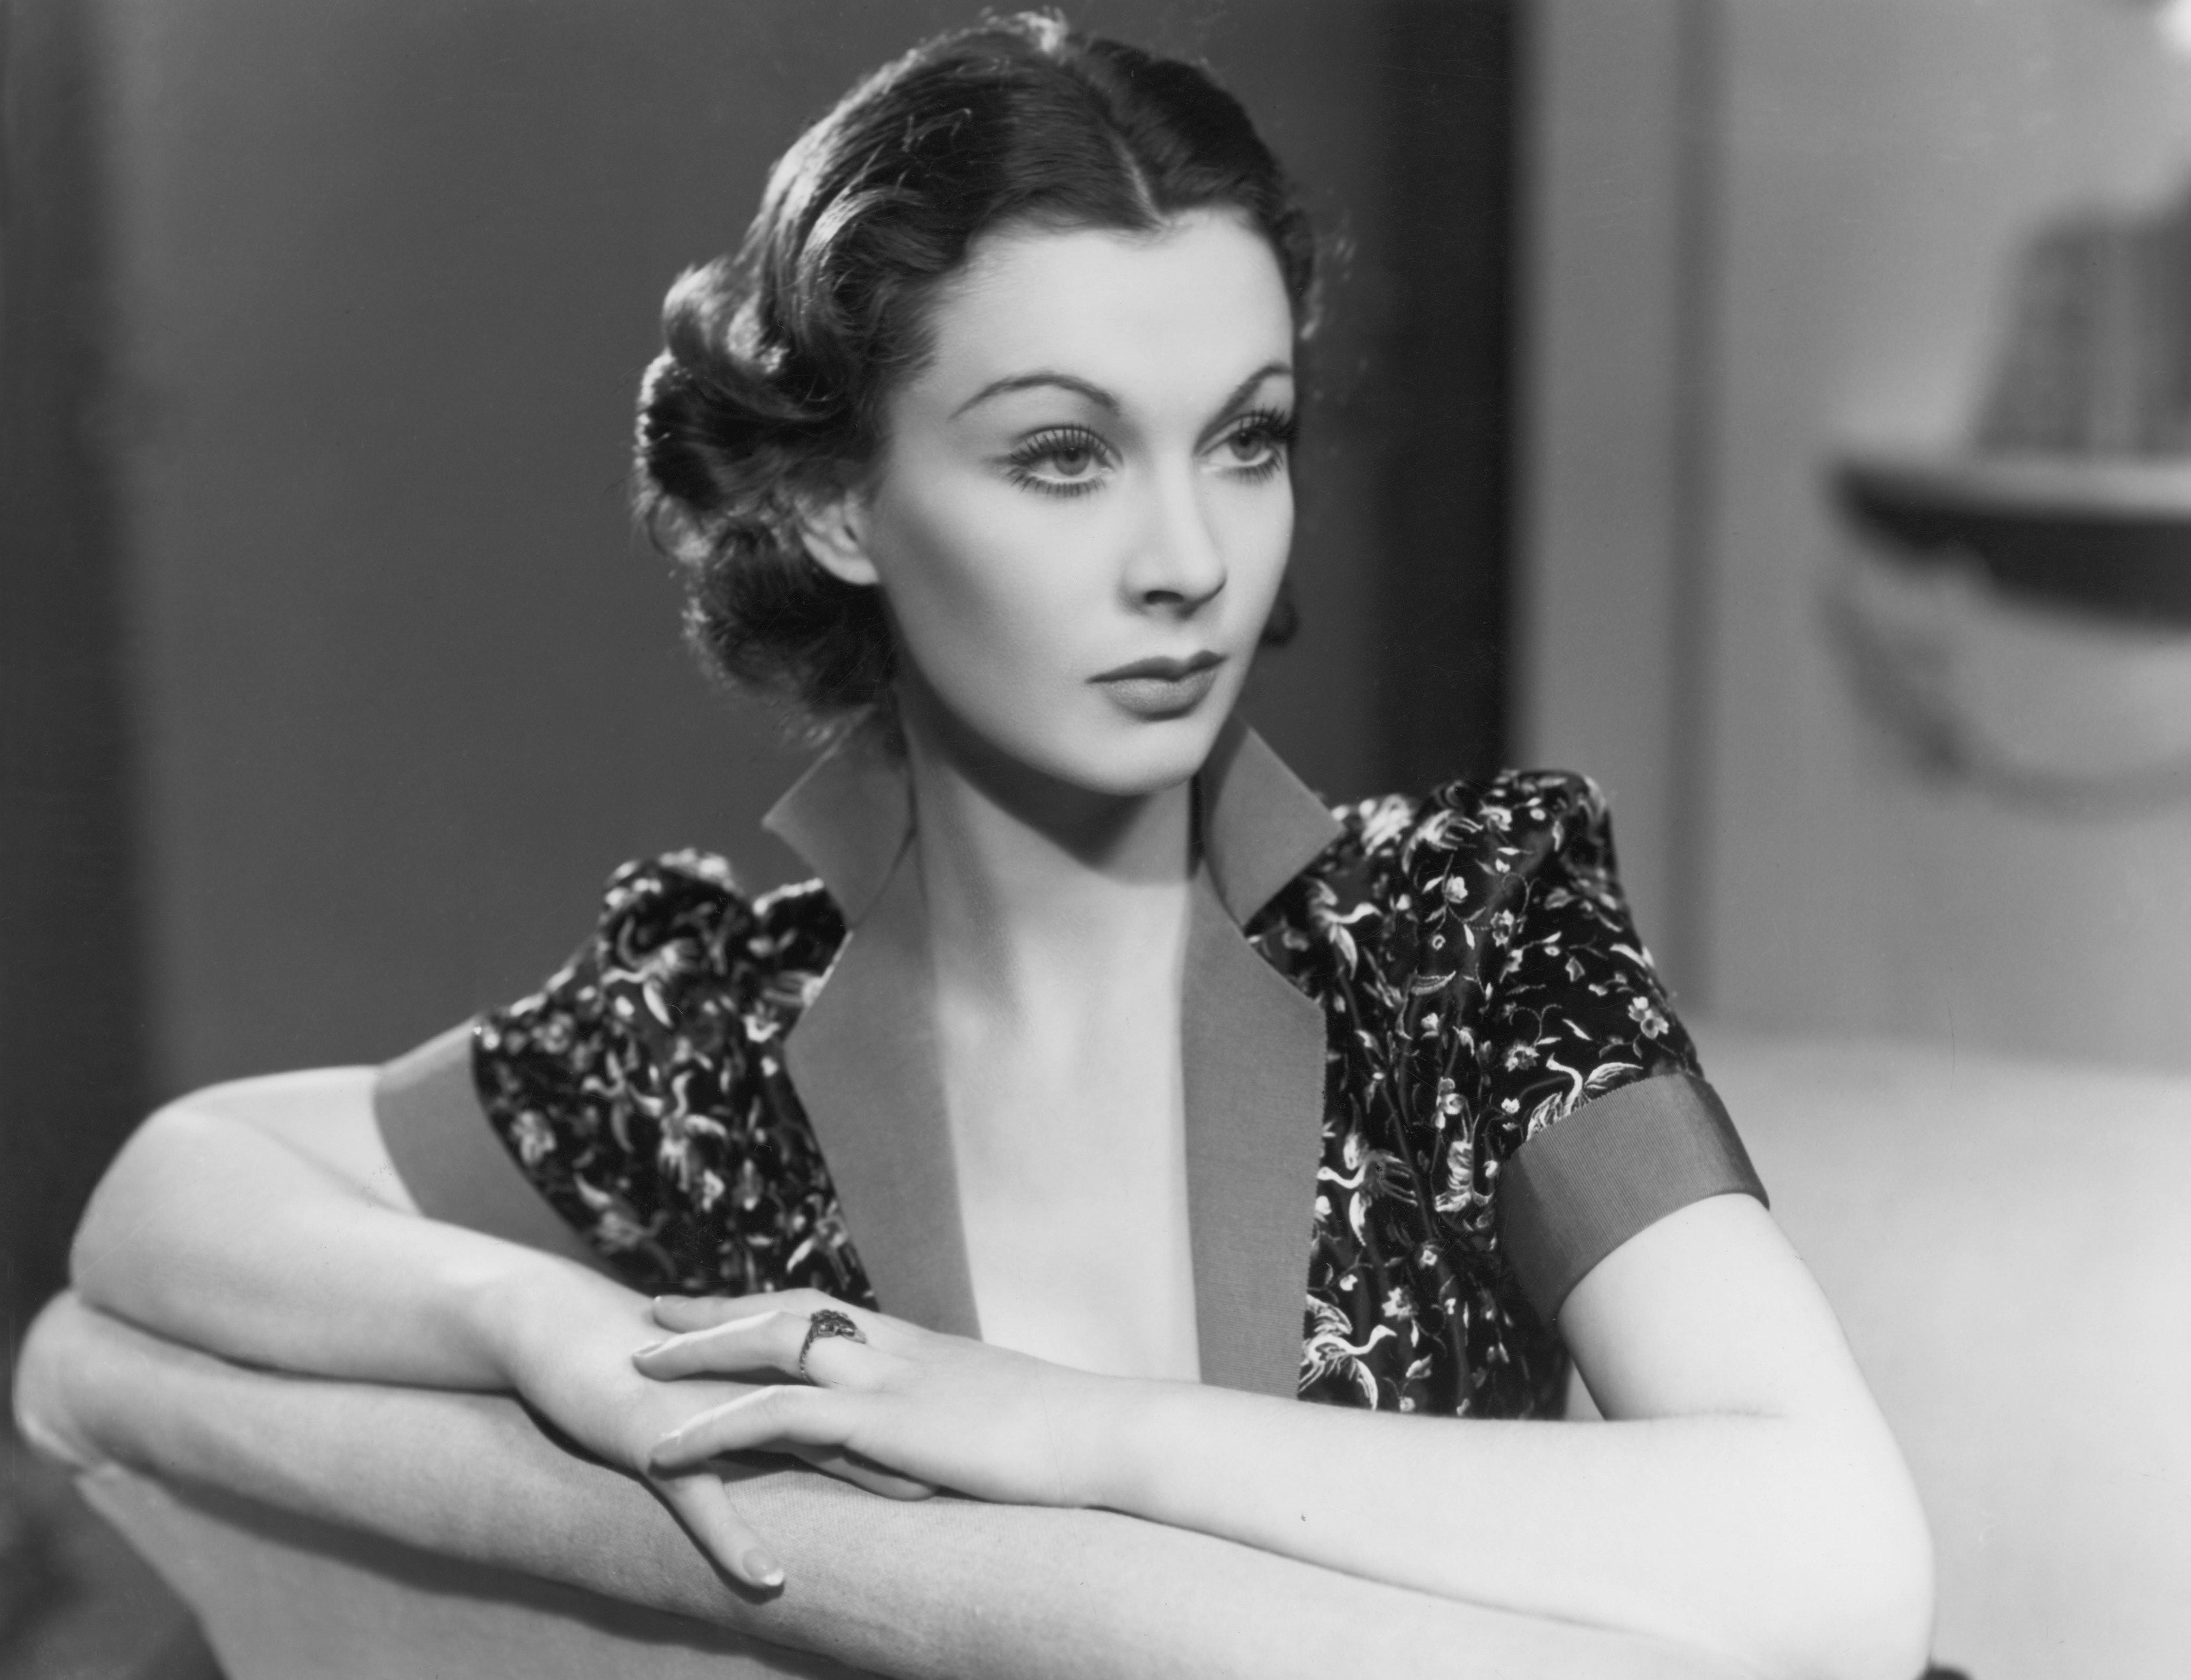 Jordan-Claire Green,Rosemary Harris (born 1927 (naturalized American citizen) Sex pics & movies Alina Puscau ROU,Lindsay Pulsipher